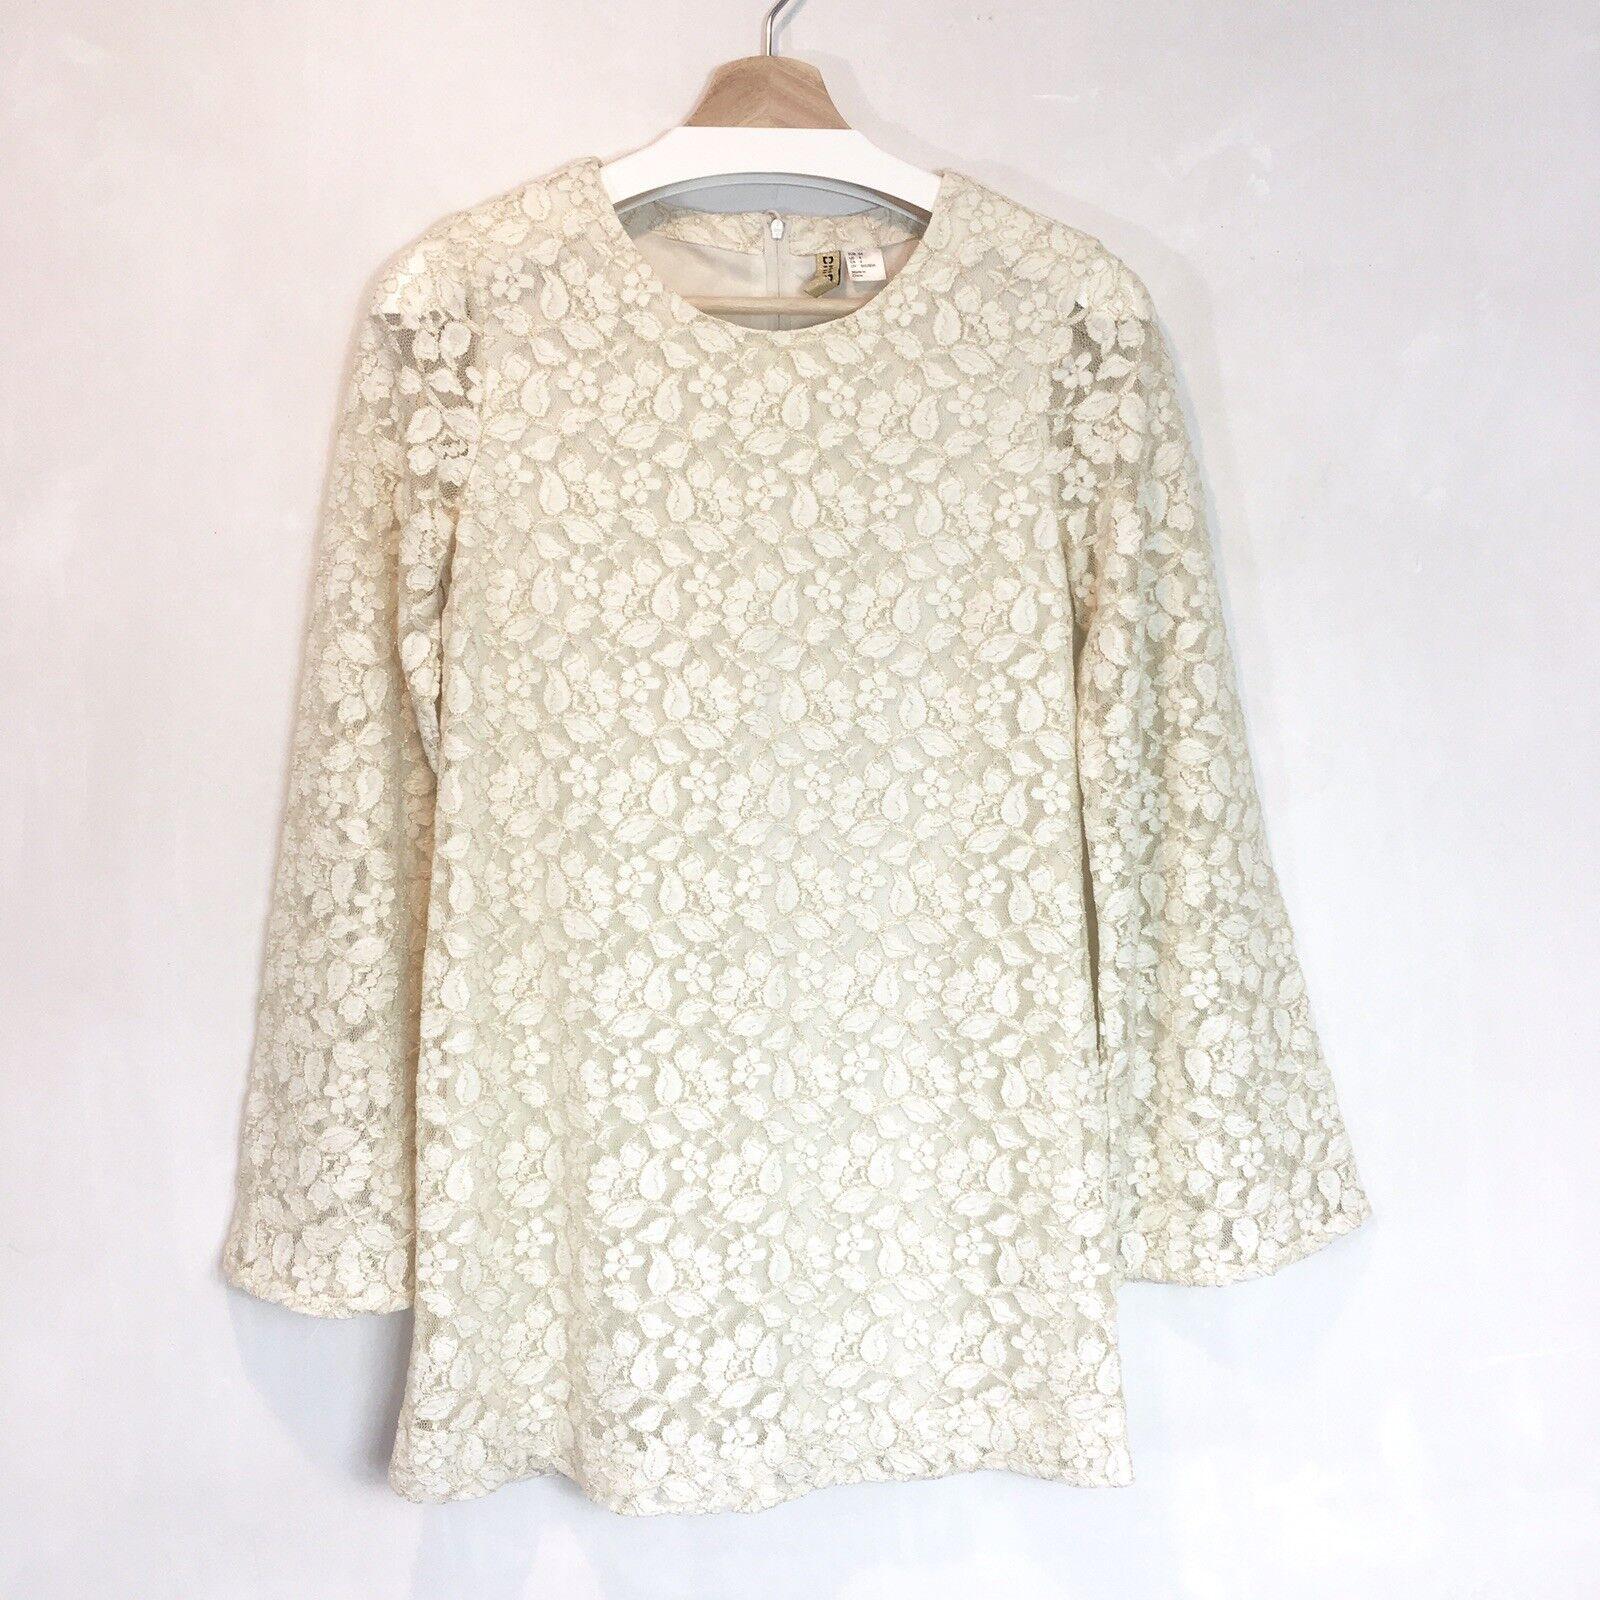 H&M Womens Ivory gold Lace Bell Sleeve Mini Dress Tunic Mod Boho Sz 34 4